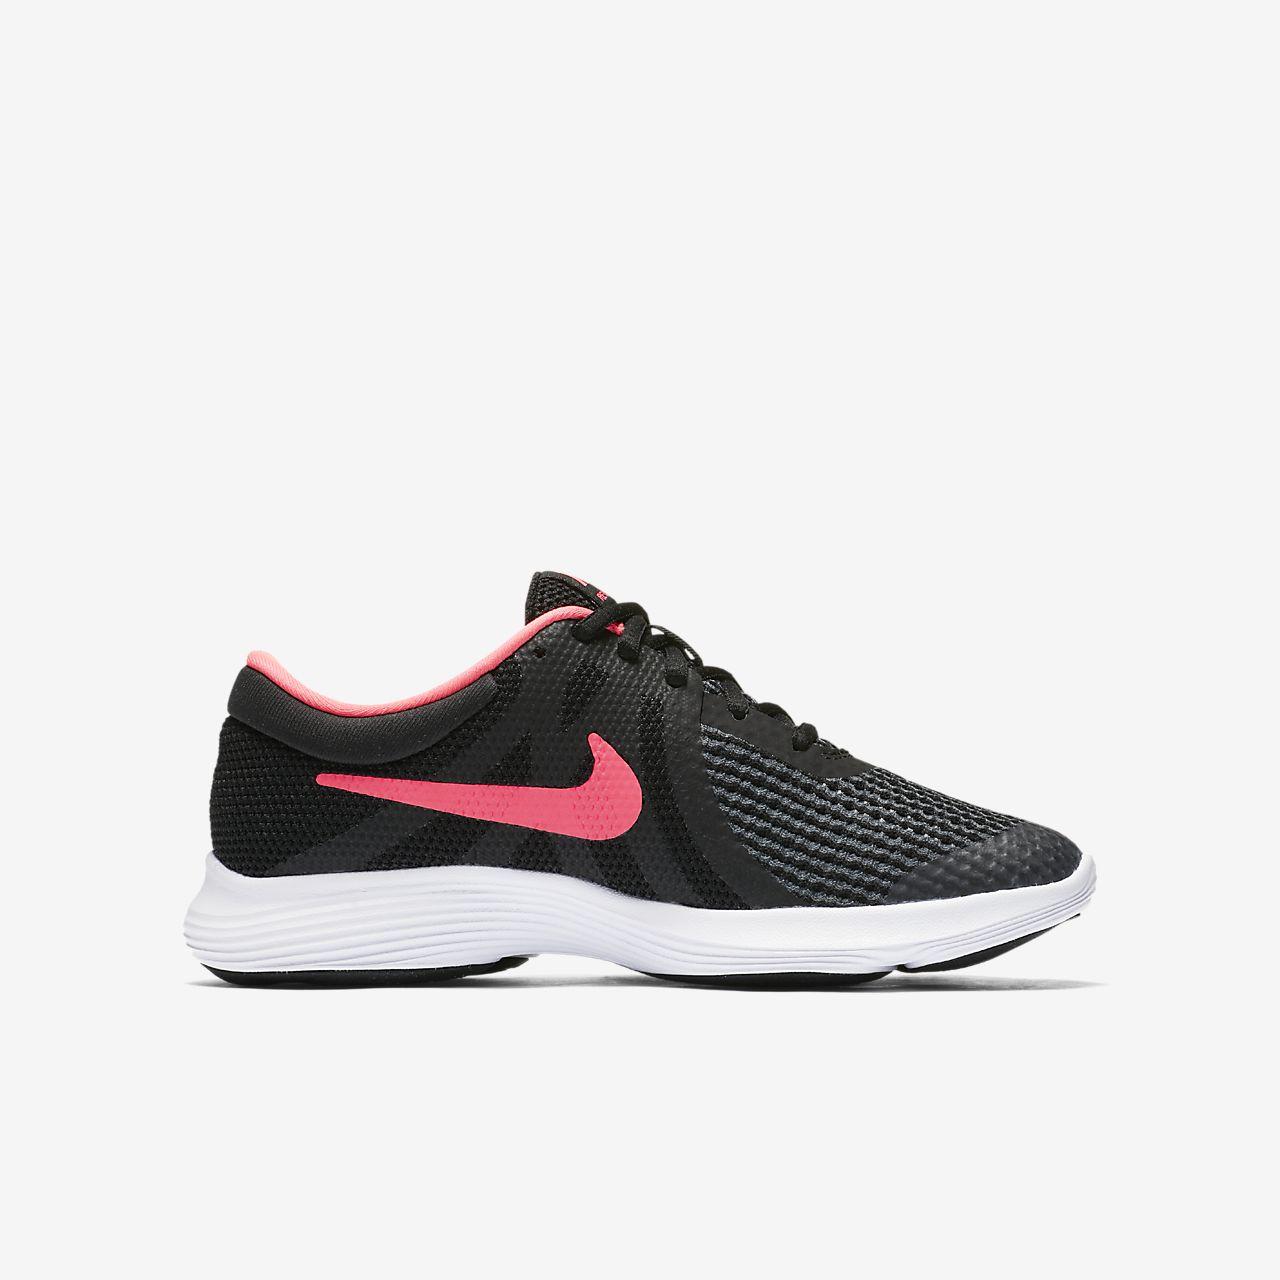 0ce9cef0f4eee Nike Revolution 4 Older Kids  Running Shoe. Nike.com GB